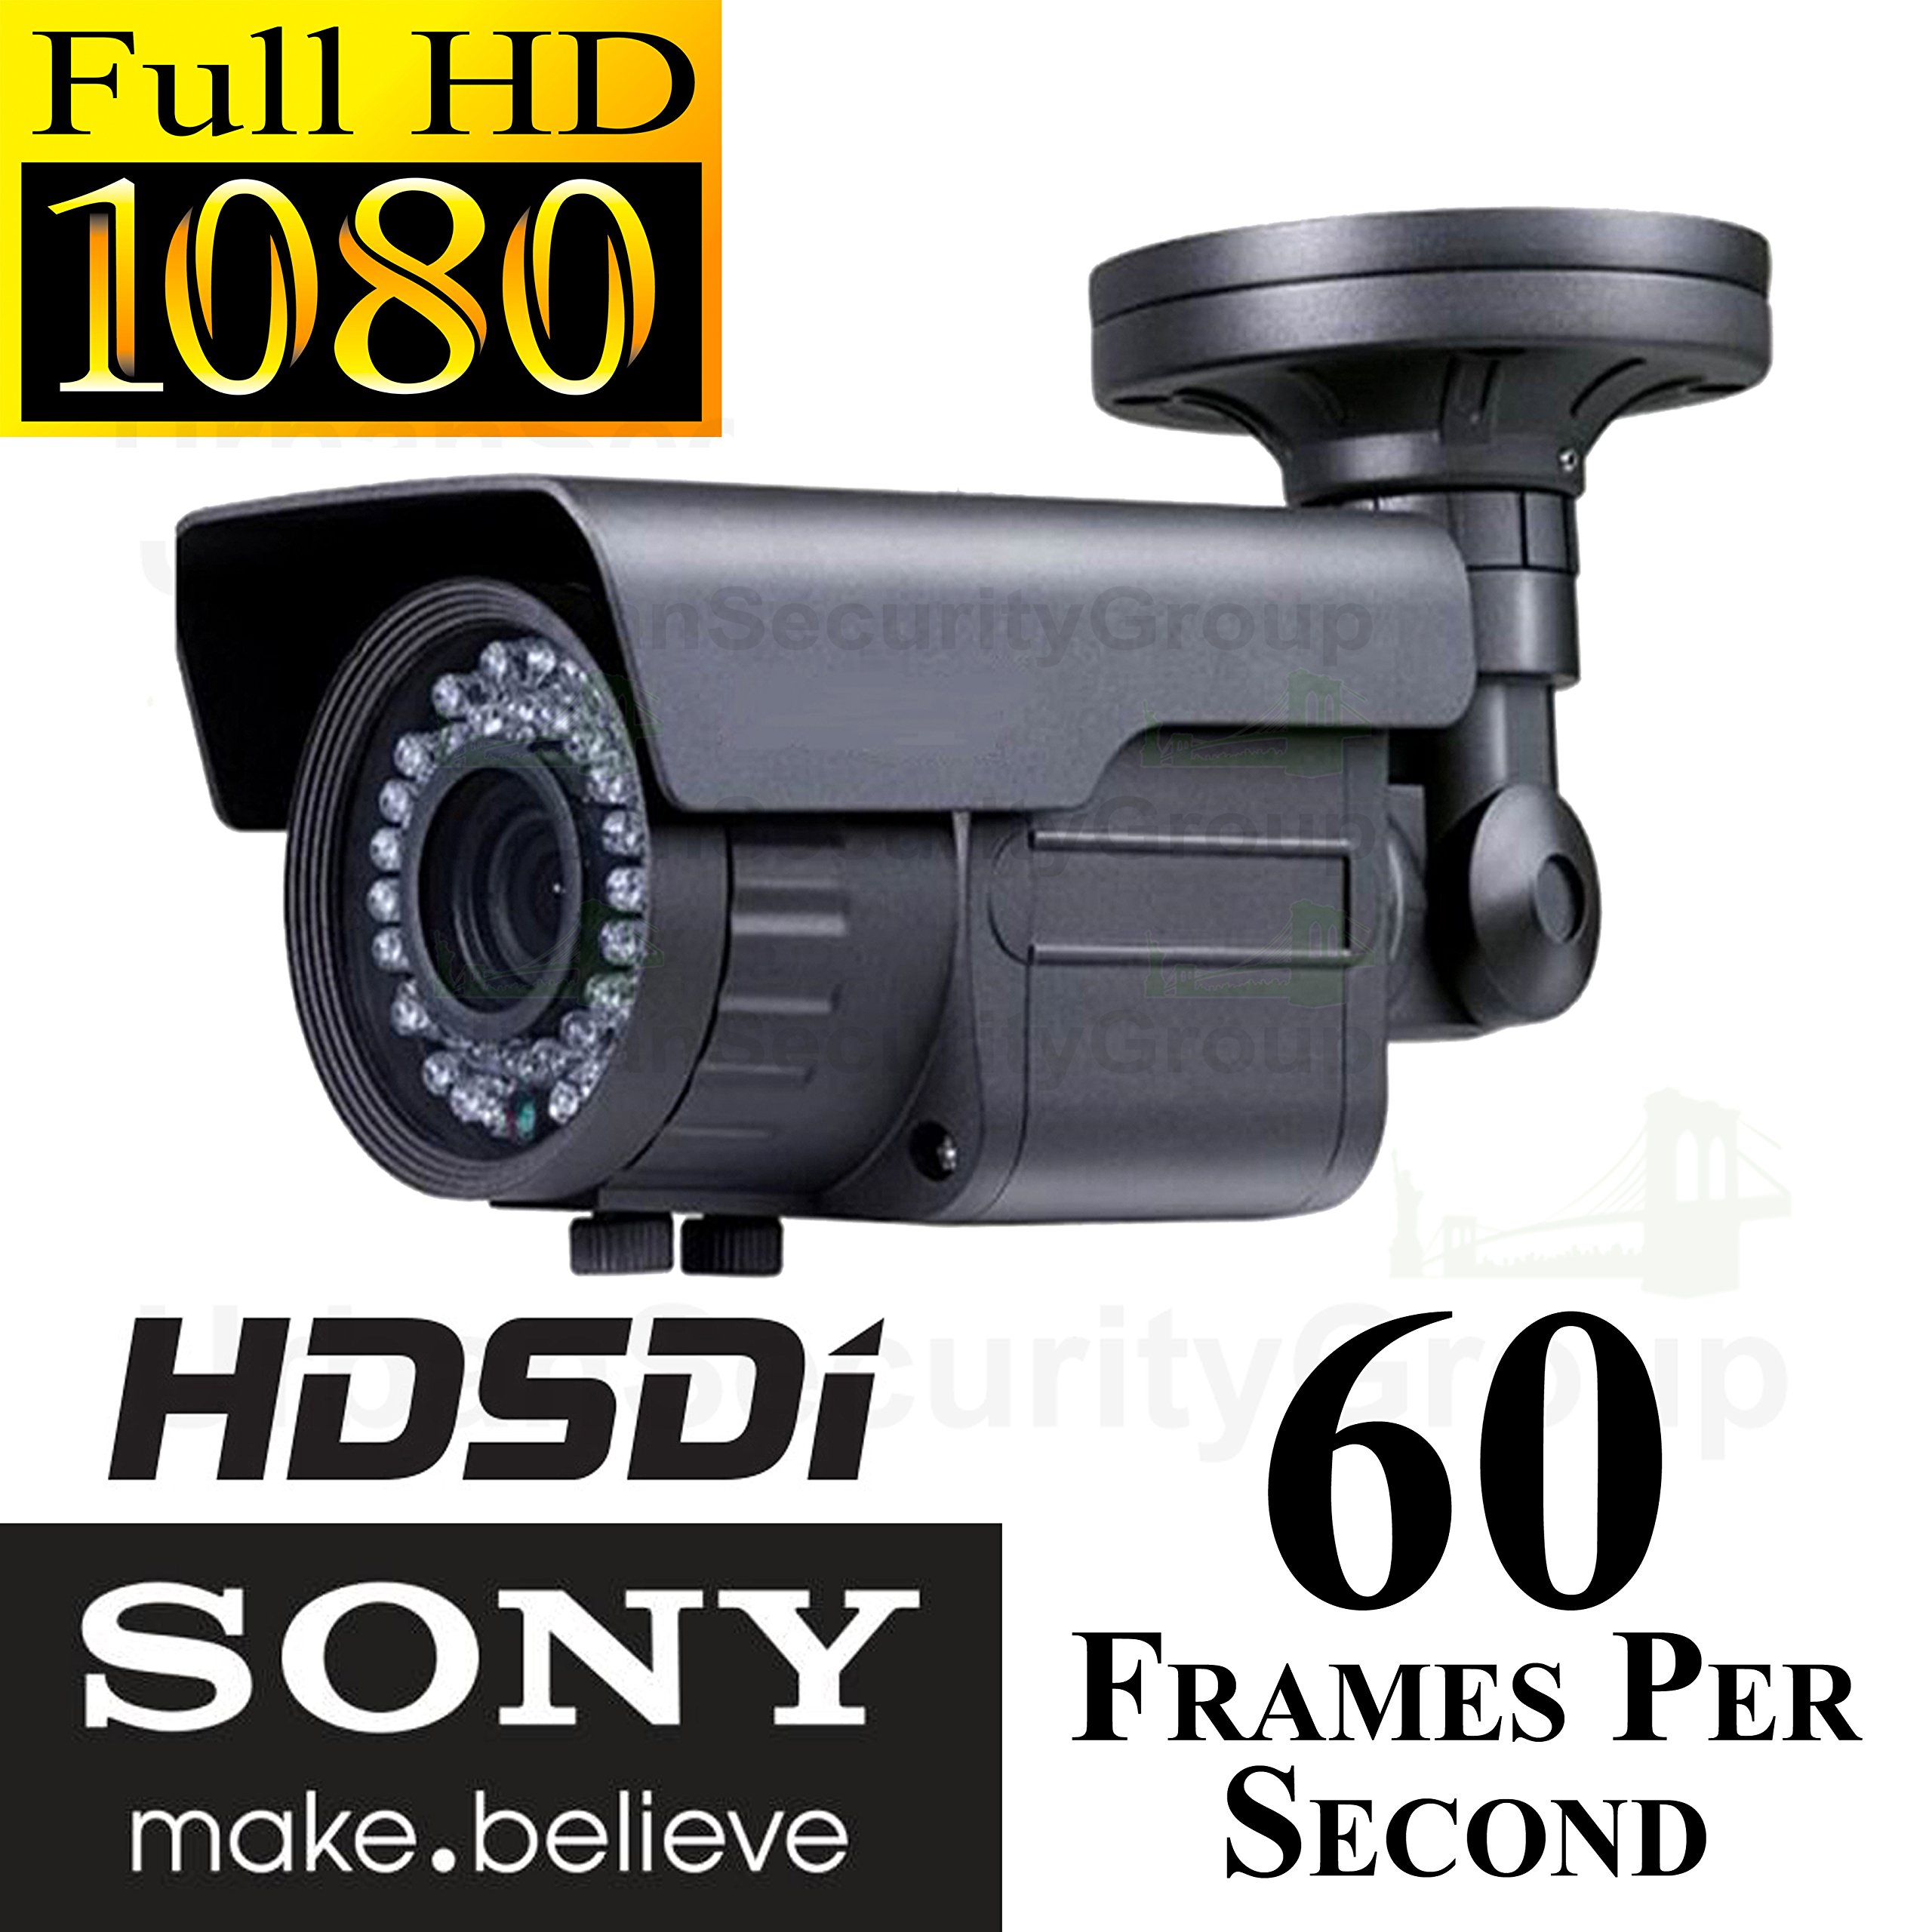 USG Sony HD-SDI 1080P Bullet Security Camera: 2.1 Megapixels, 1920x1080 Video Resolution, 2.8-12mm Varifocal Lens, Sony HD CMOS Sensor, 42x IR LEDs Ideal For Business Video Surveillance